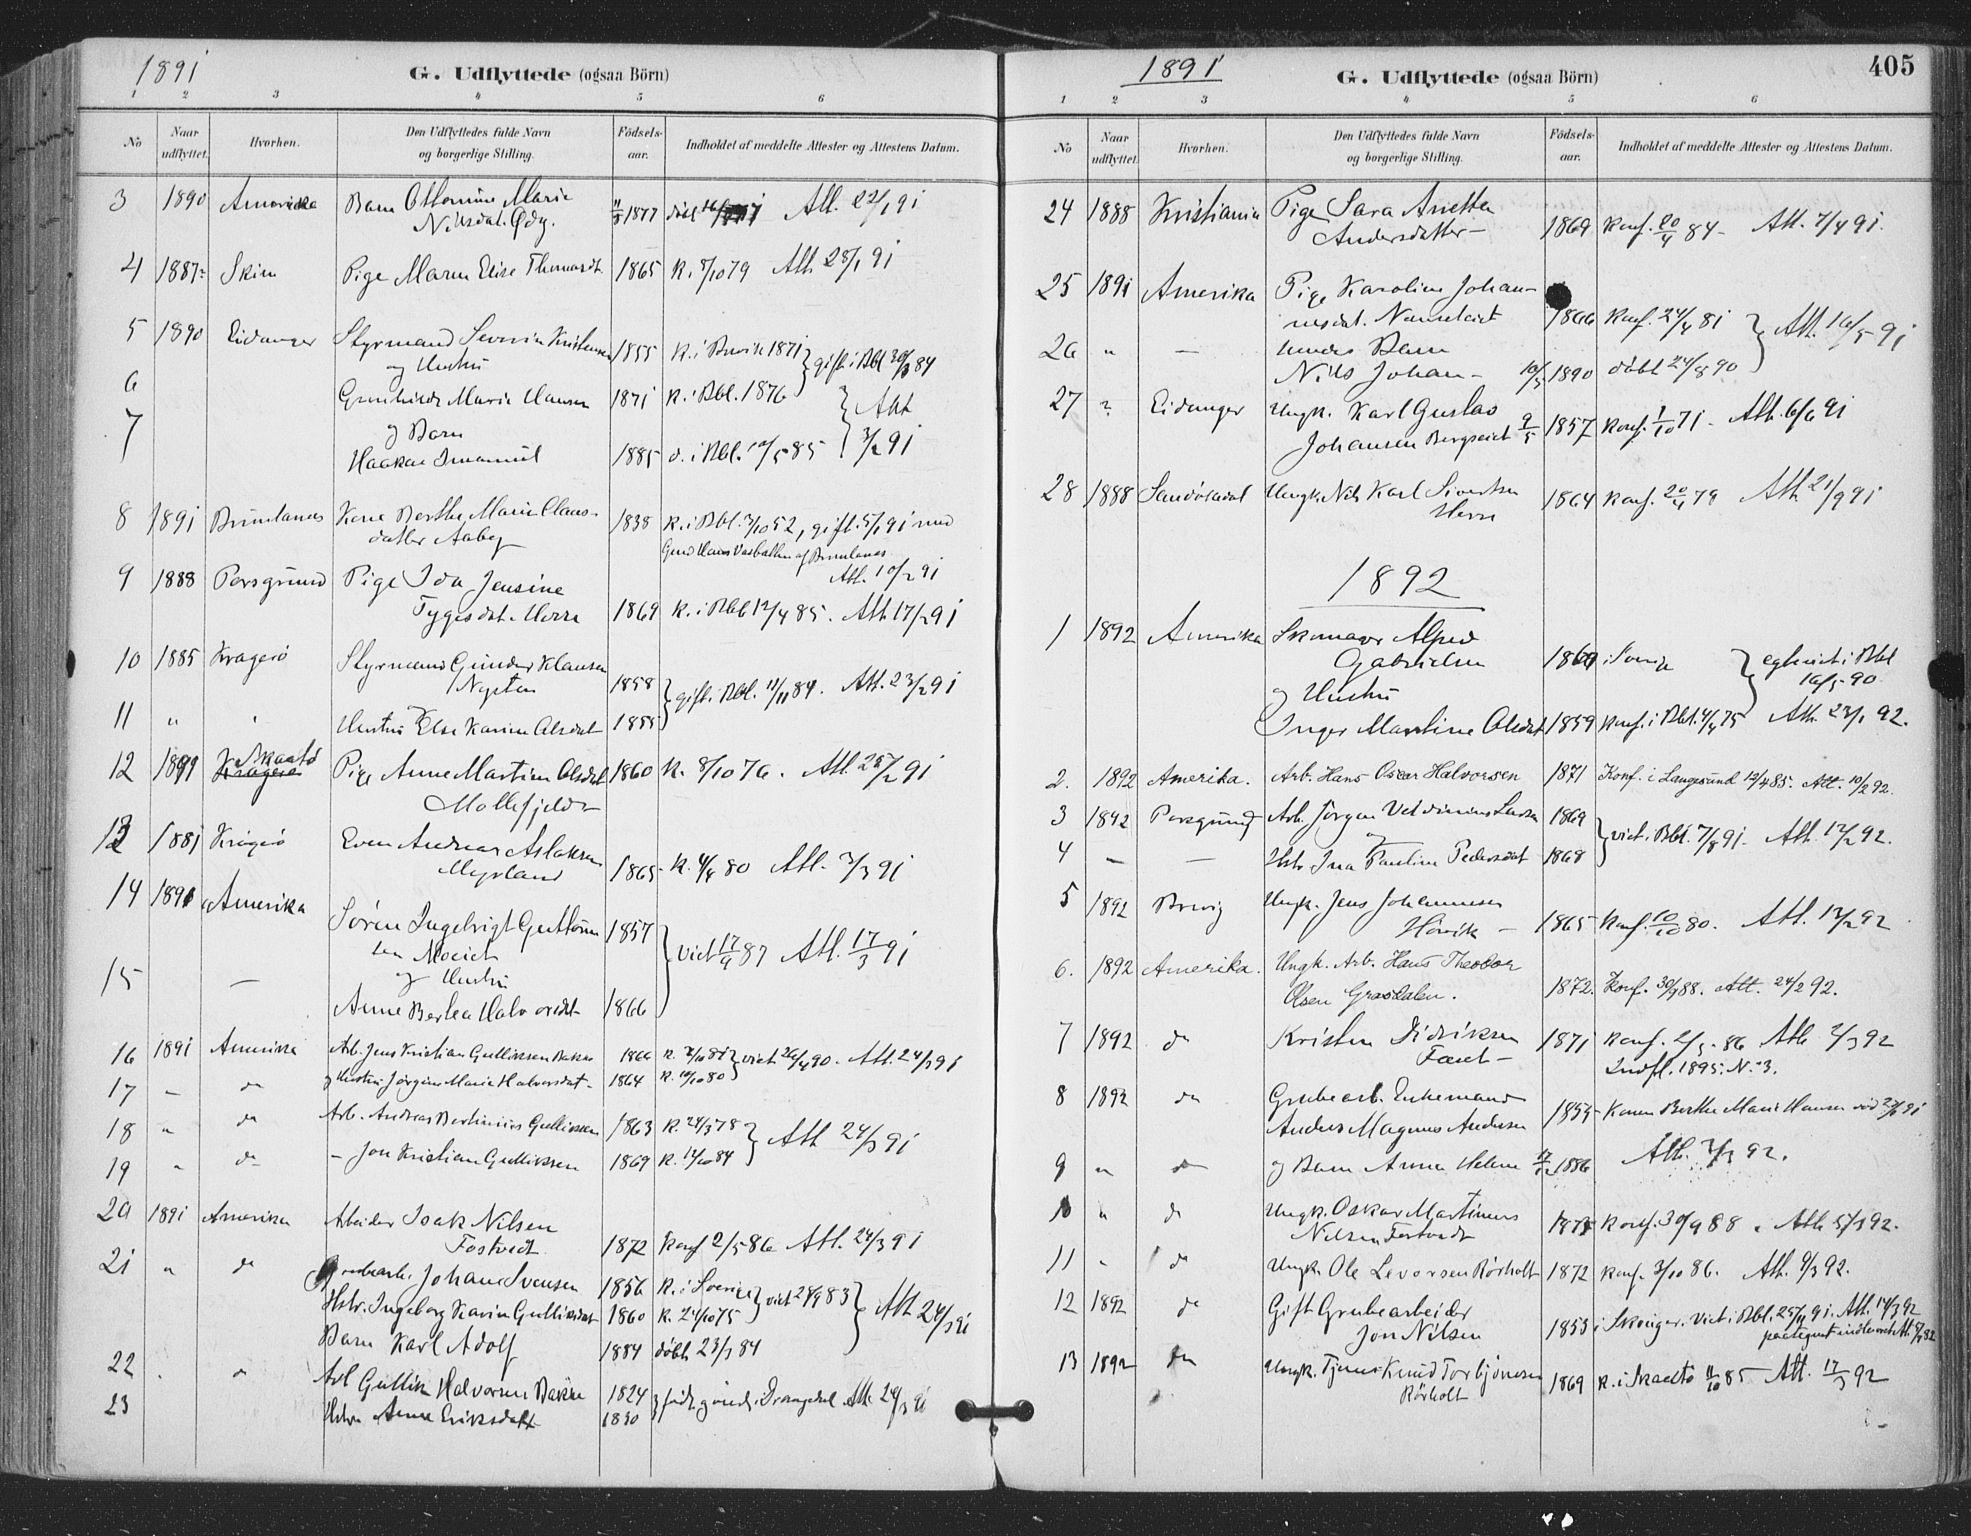 SAKO, Bamble kirkebøker, F/Fa/L0008: Ministerialbok nr. I 8, 1888-1900, s. 405